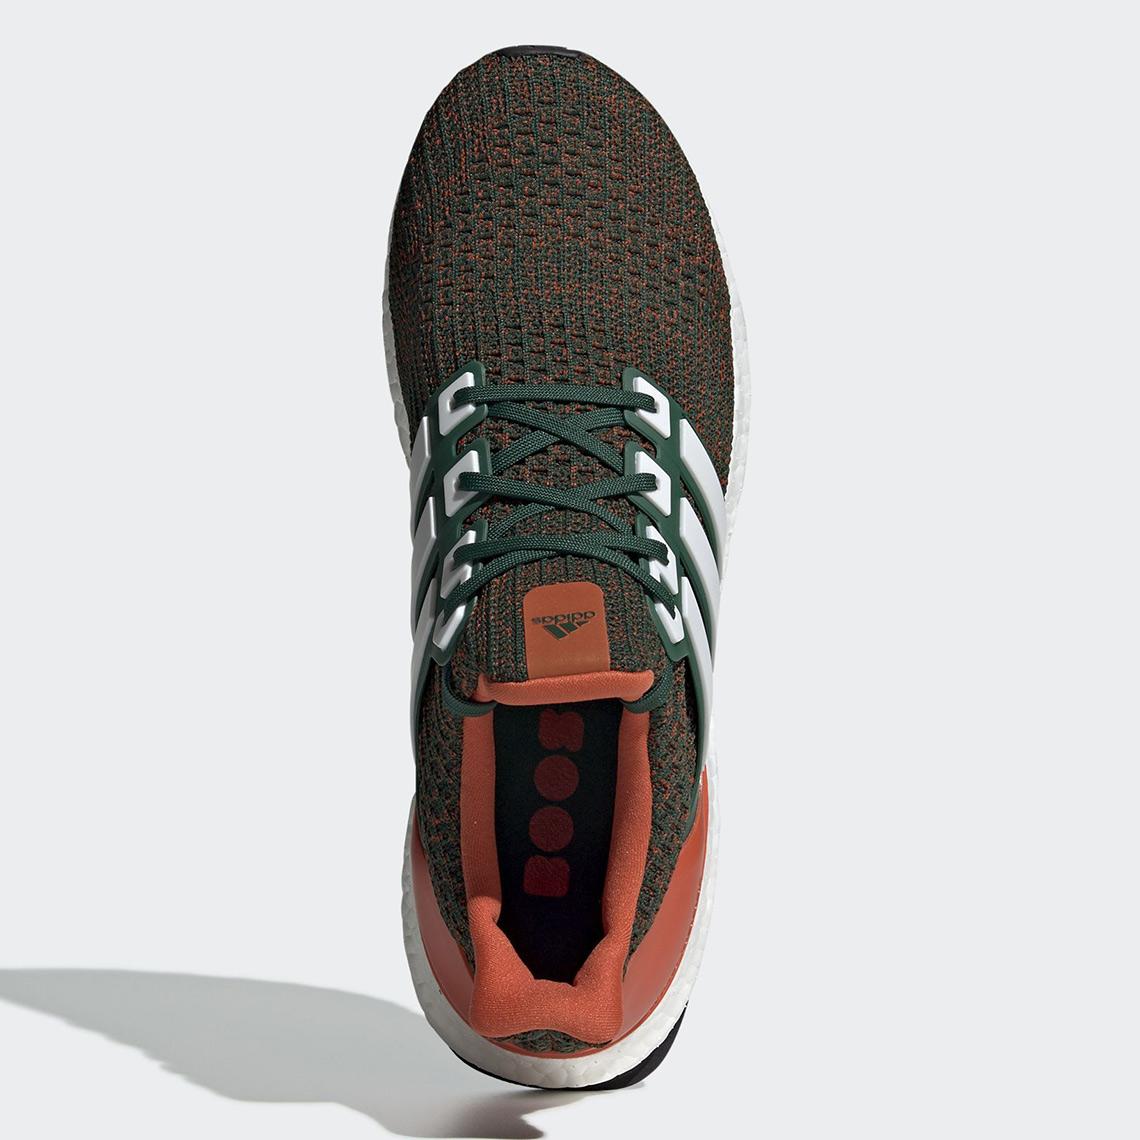 hot sale online d3c4b e6334 adidas Ultra Boost Miami Hurricanes EE3702   SneakerNews.com